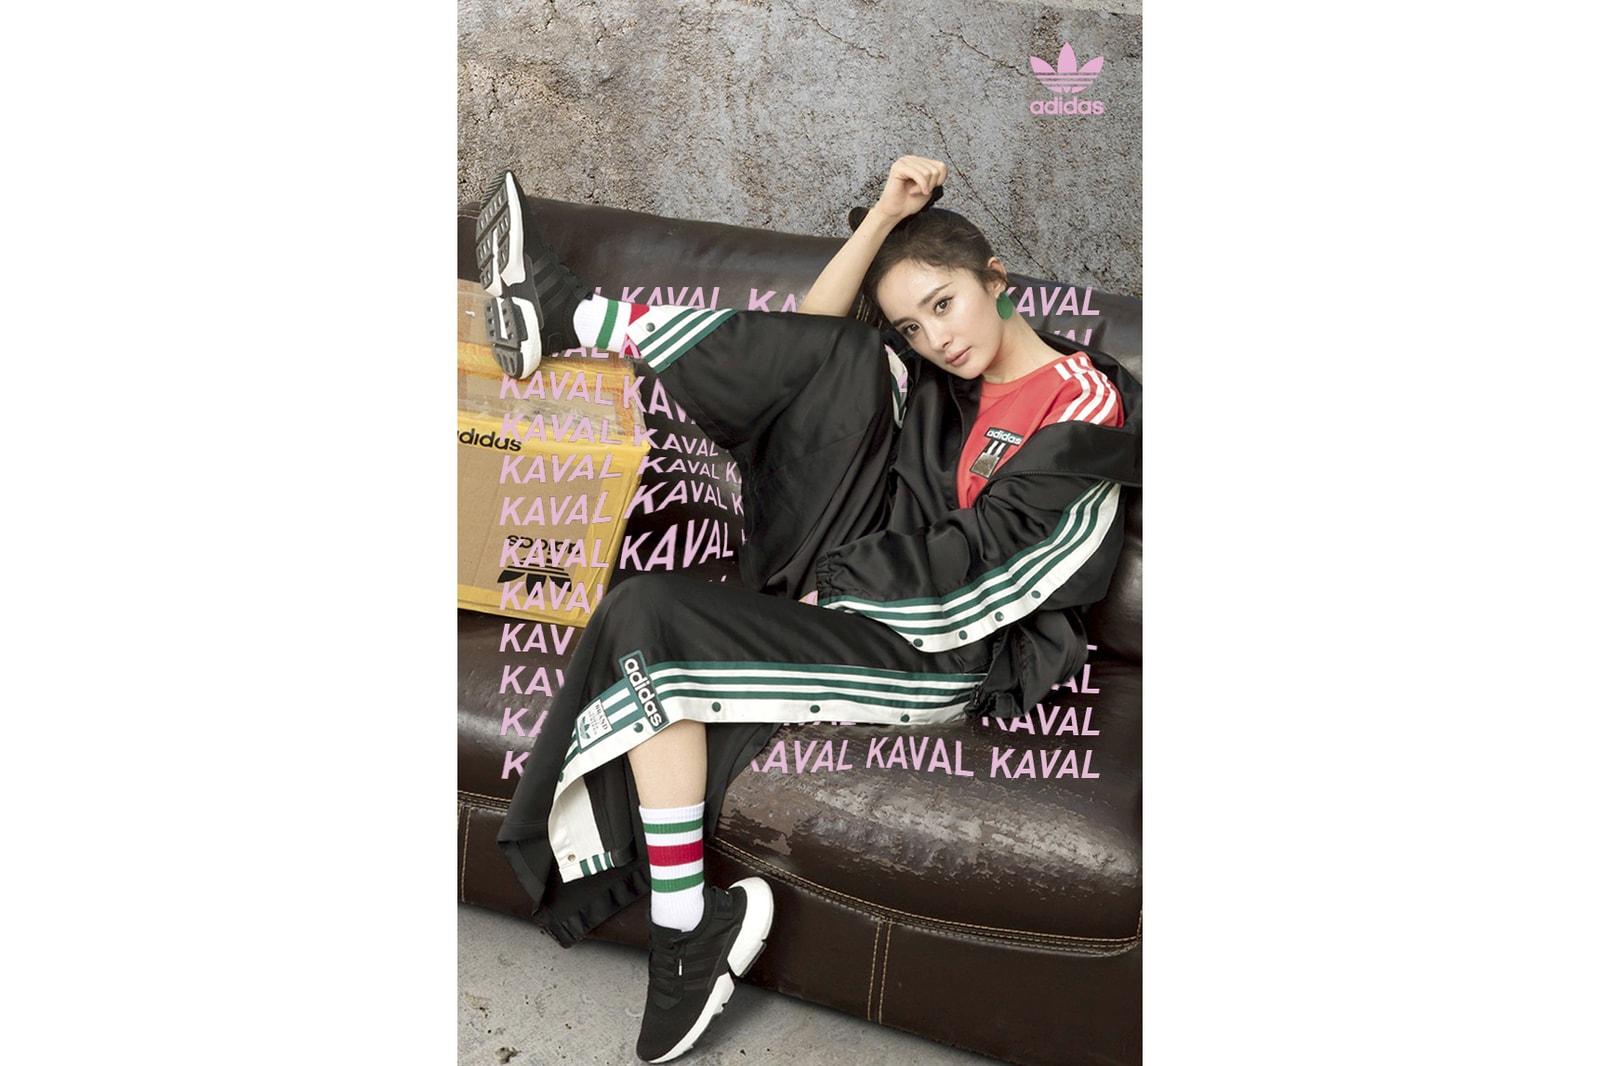 adidas Originals 全新品牌企劃「Original Is Never Finished」宣傳影片發佈